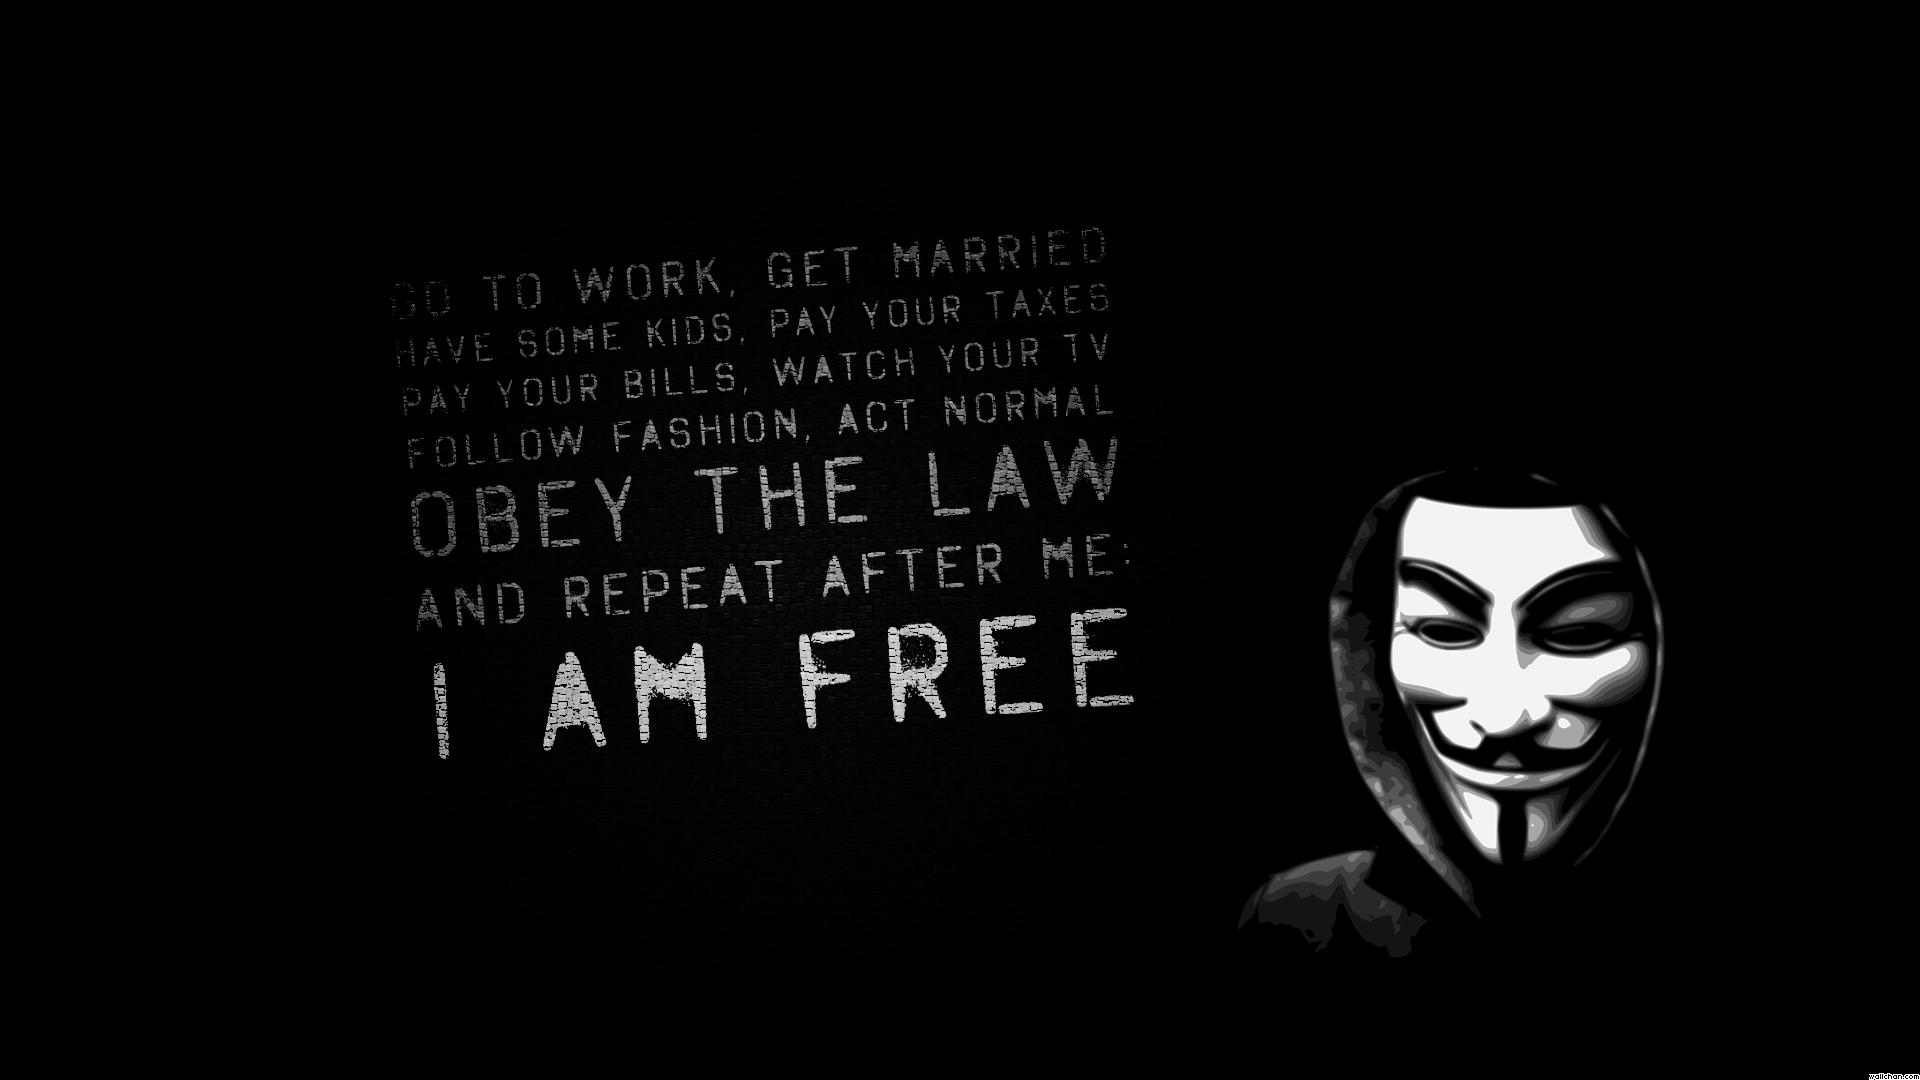 V For Vendetta Google Search V For Vendetta Quotes Vendetta Quotes V For Vendetta